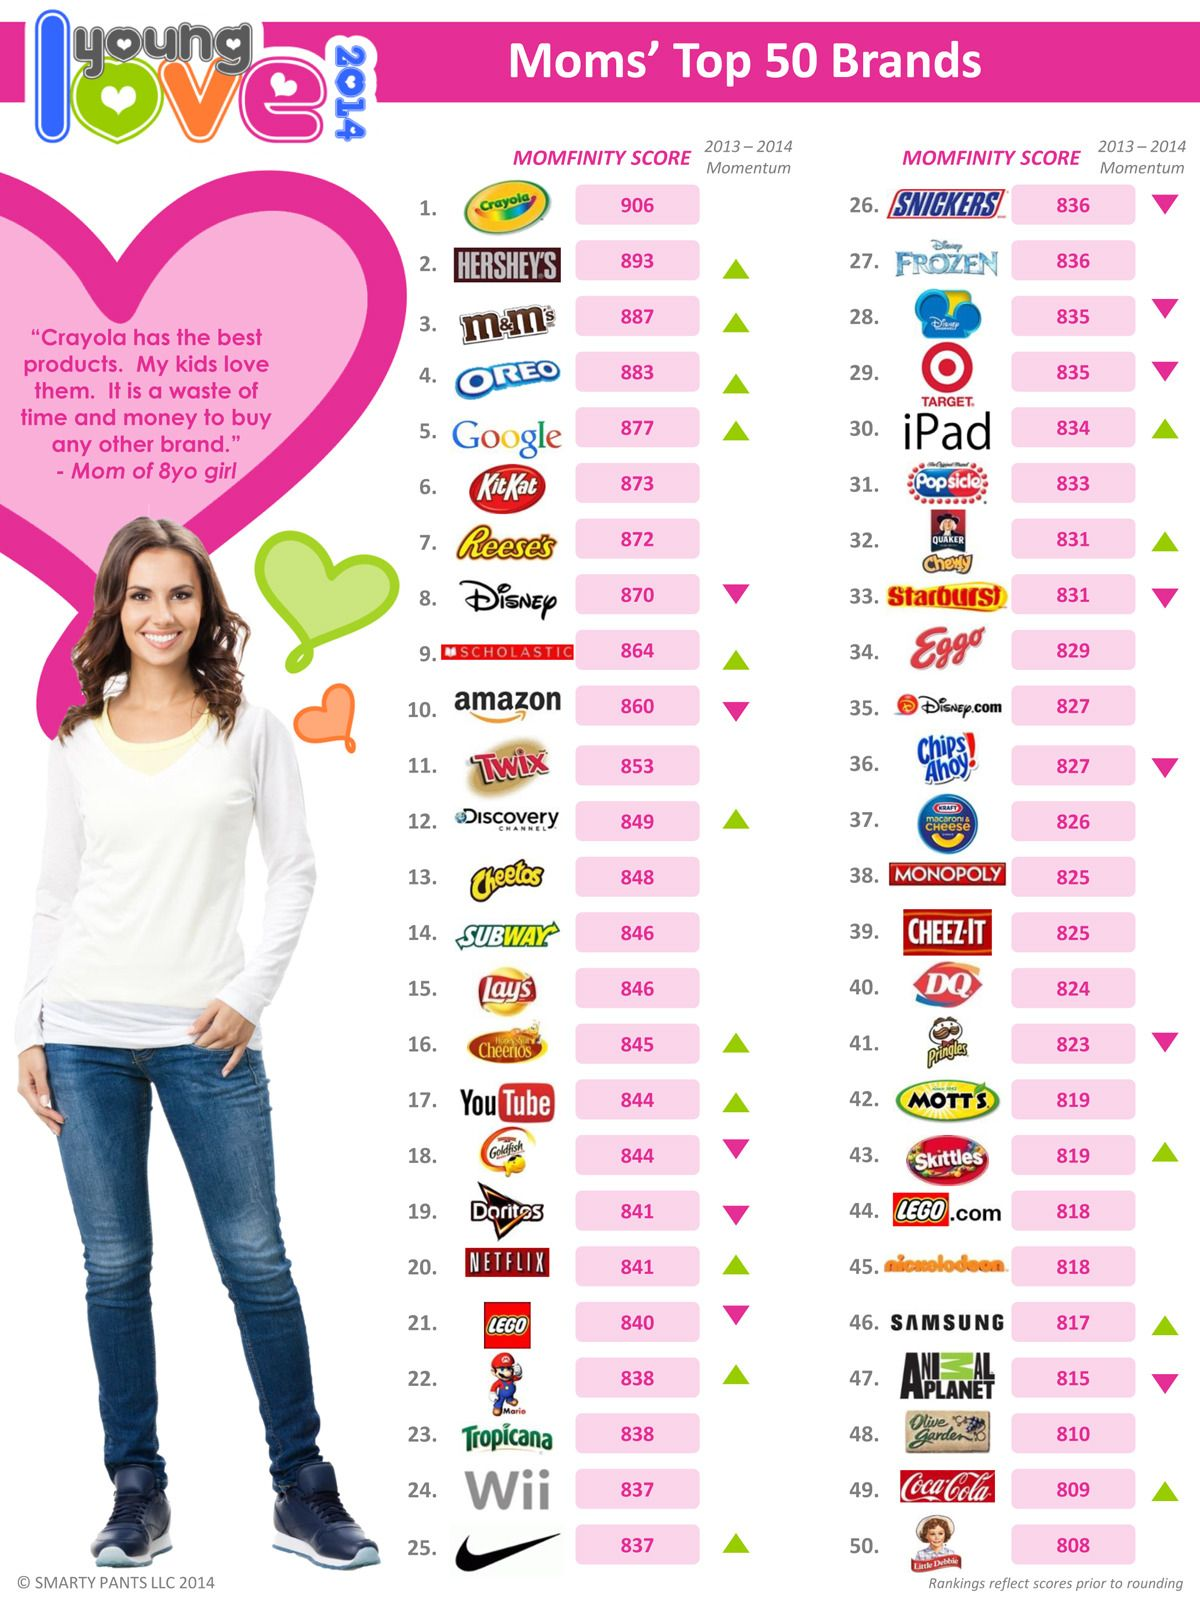 Moms Top 50 Brands List 2014.Foto: Smarty Pants